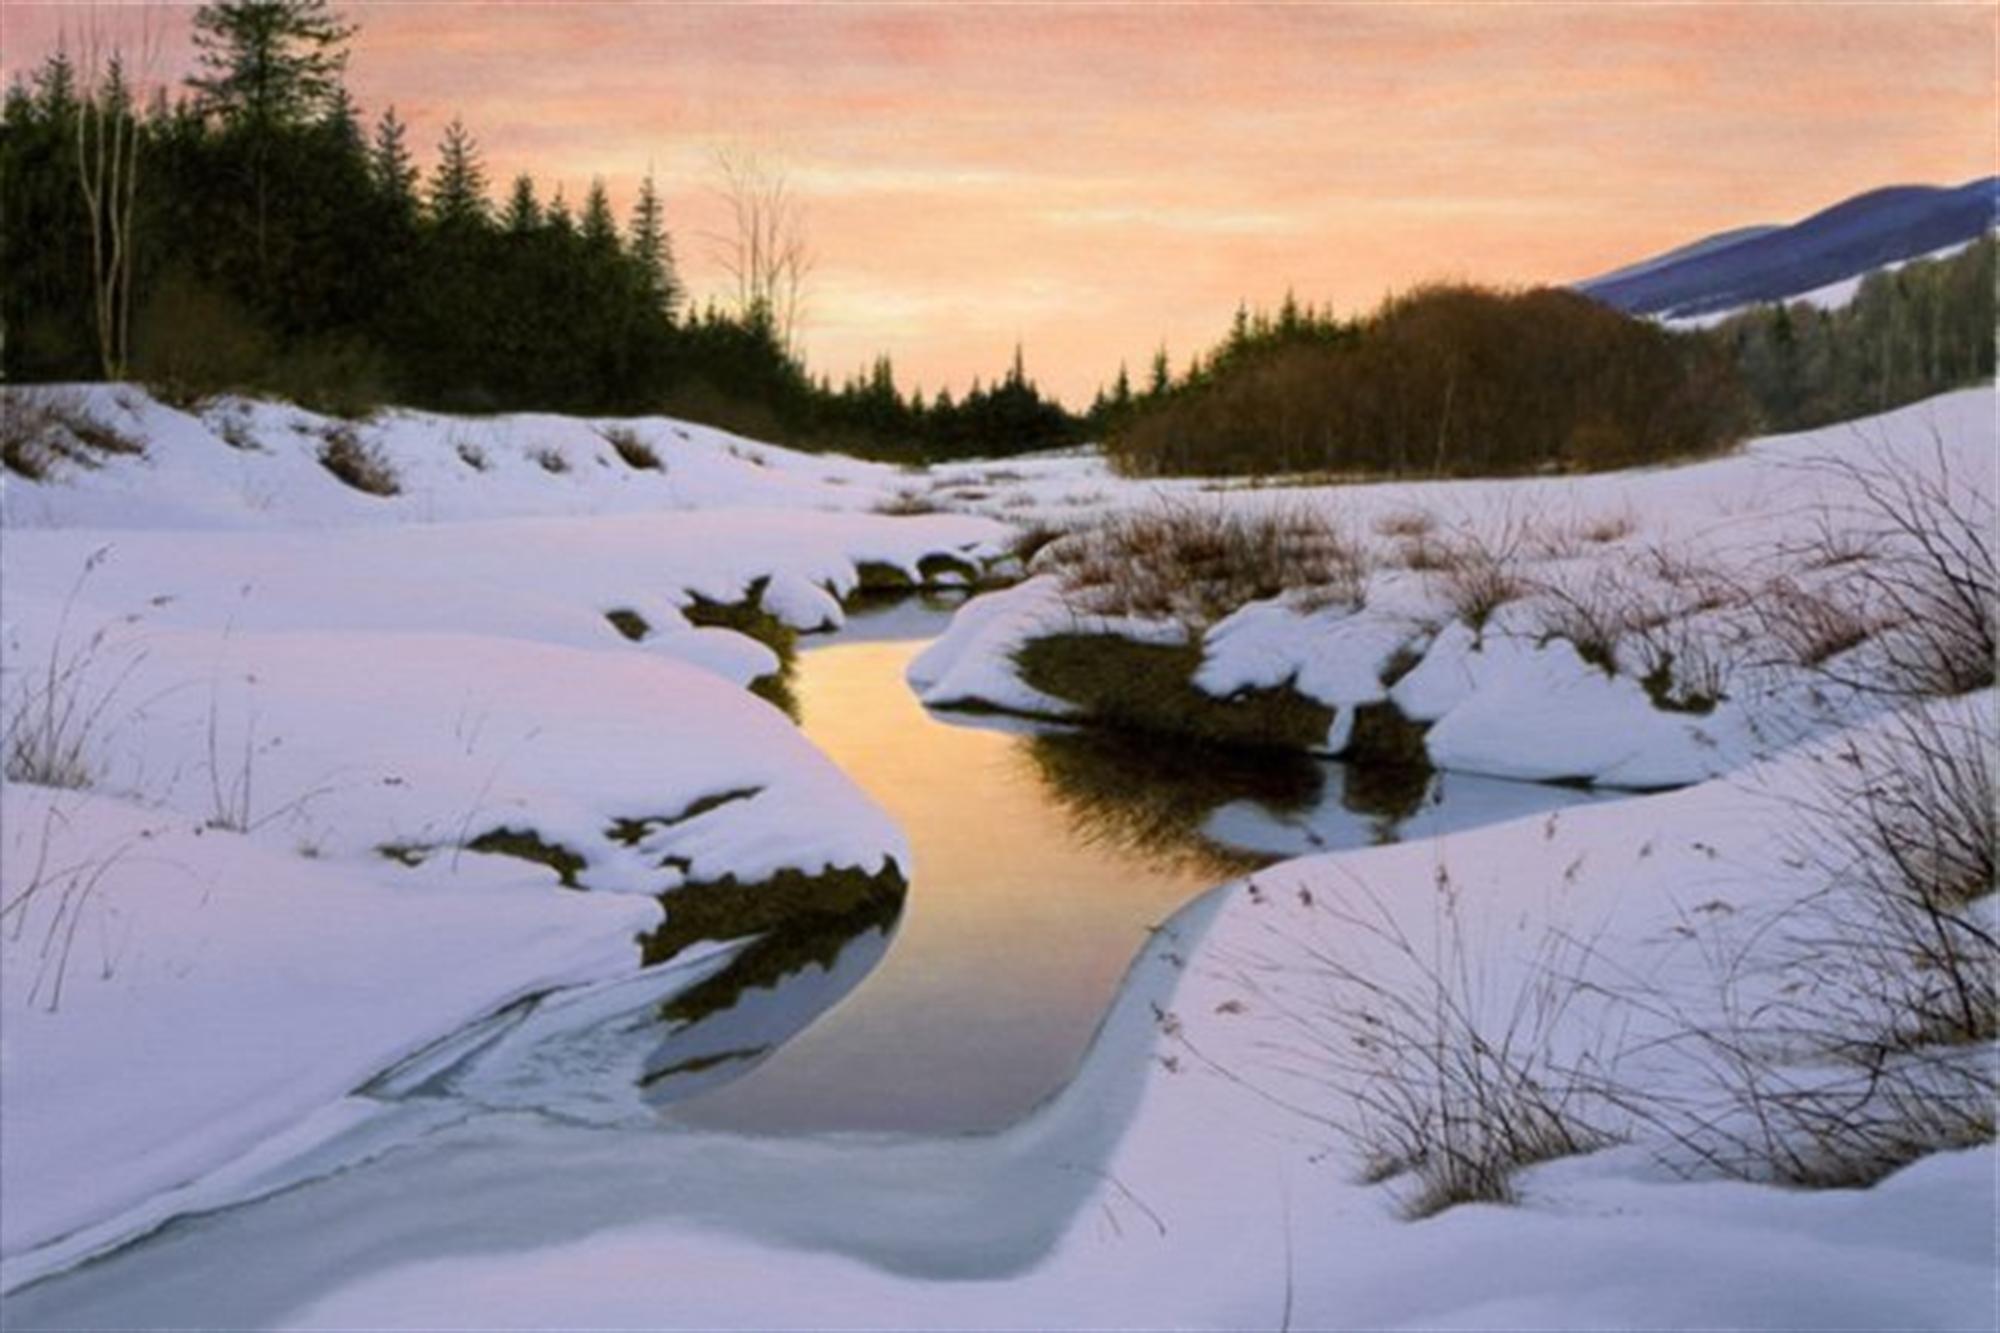 The Last Days of Winter by Alexander Volkov